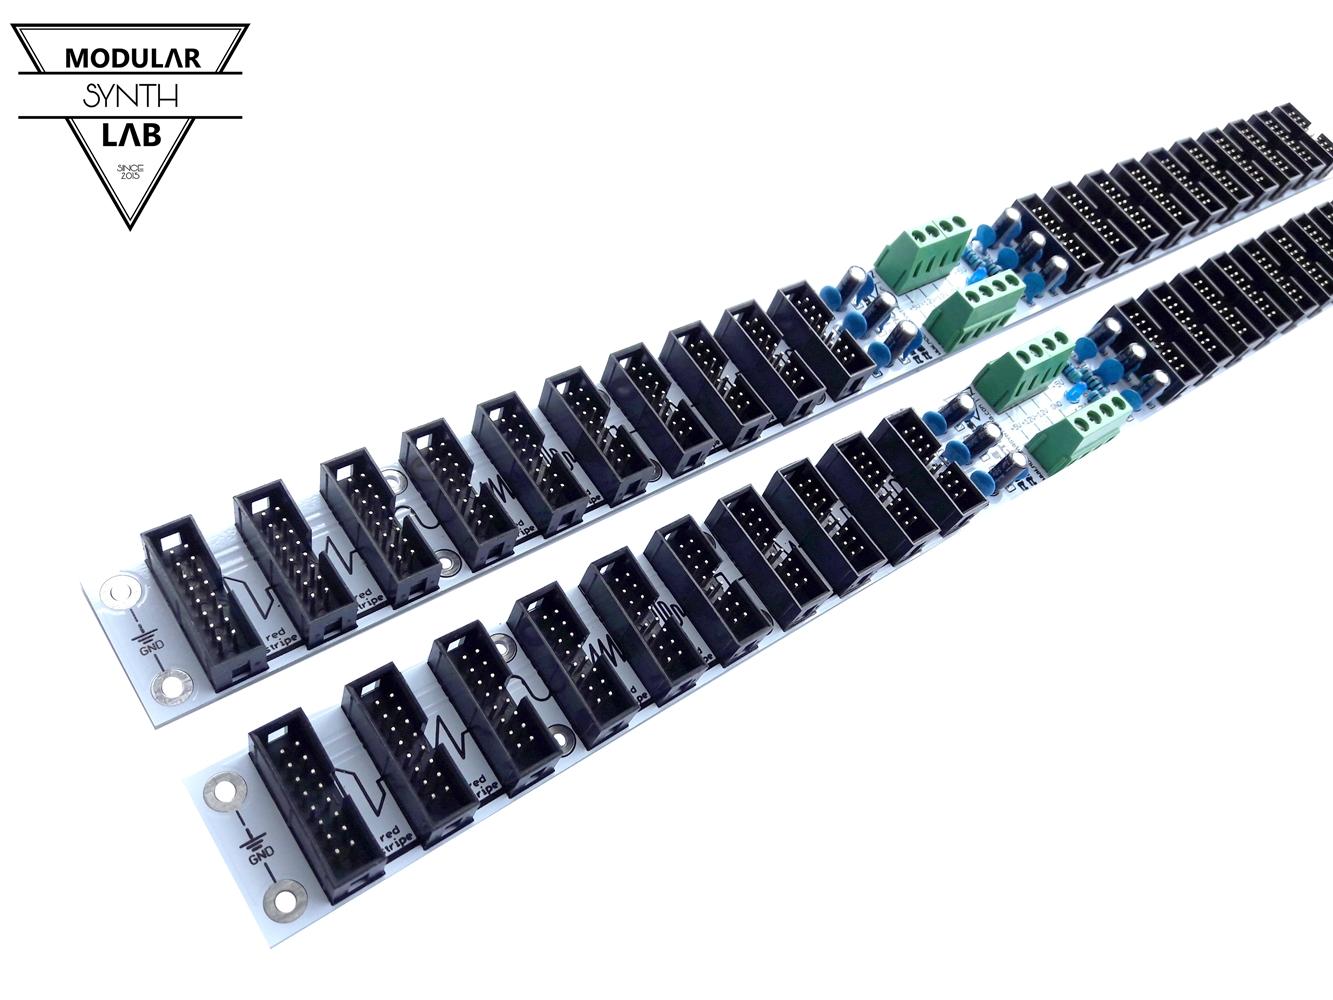 eurorack power kit modular synth power kit modularsynthlab. Black Bedroom Furniture Sets. Home Design Ideas